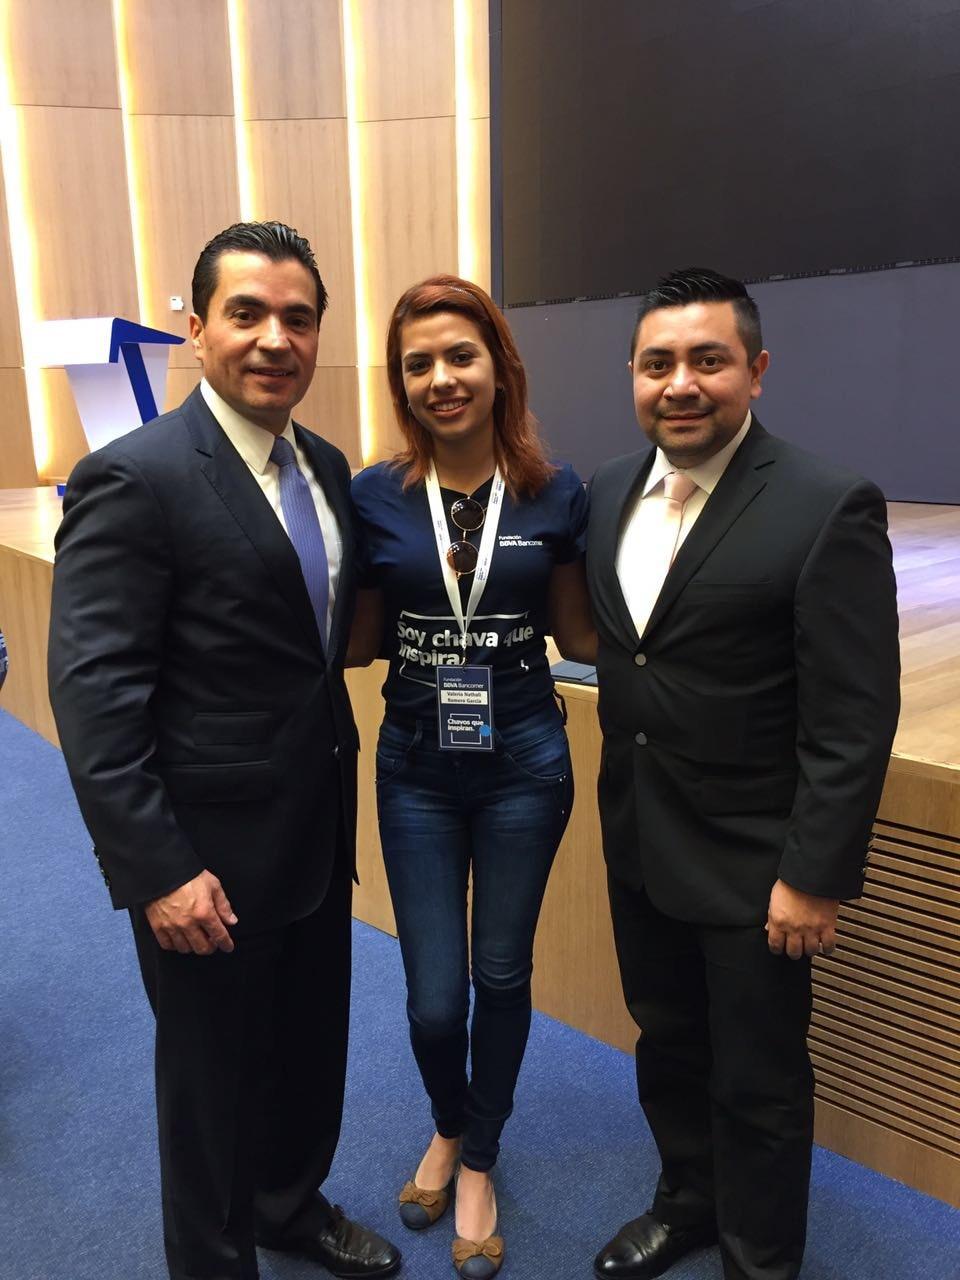 Becaria de la Fundación BBVA Bancomer con Eduardo Osuna